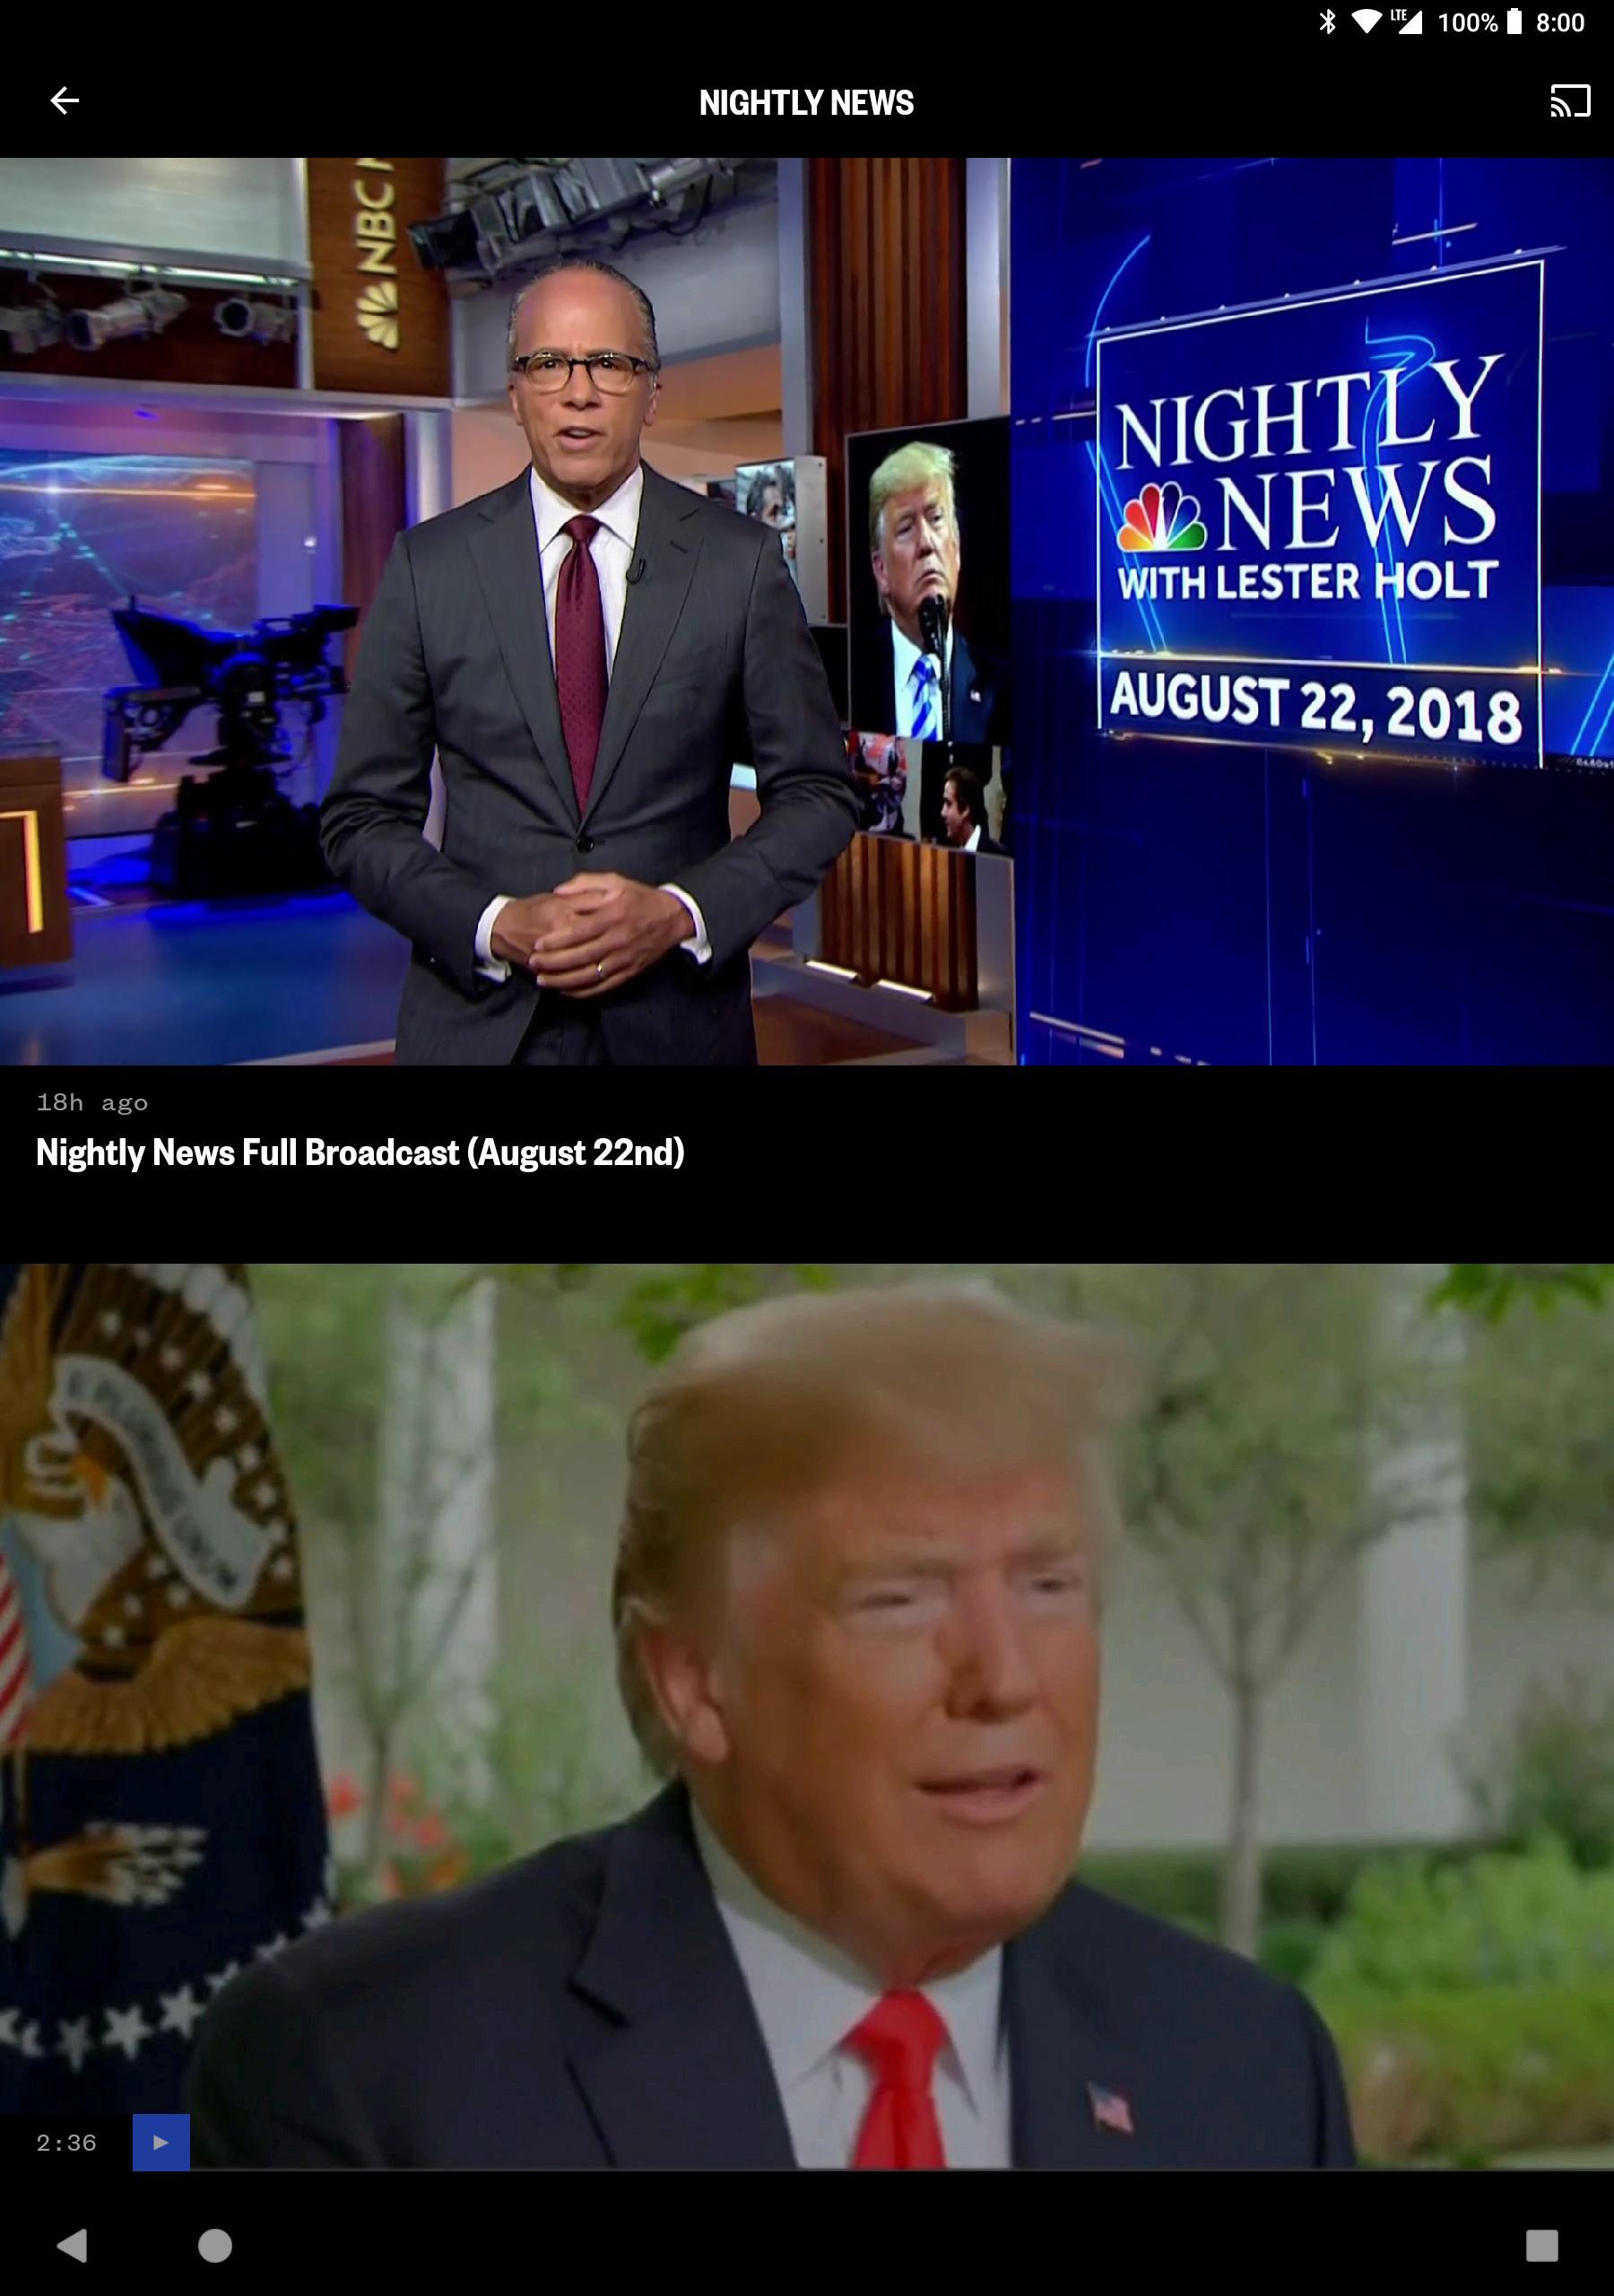 NBC News: Breaking News, US News & Live Video 6.0.11 Screenshot 10